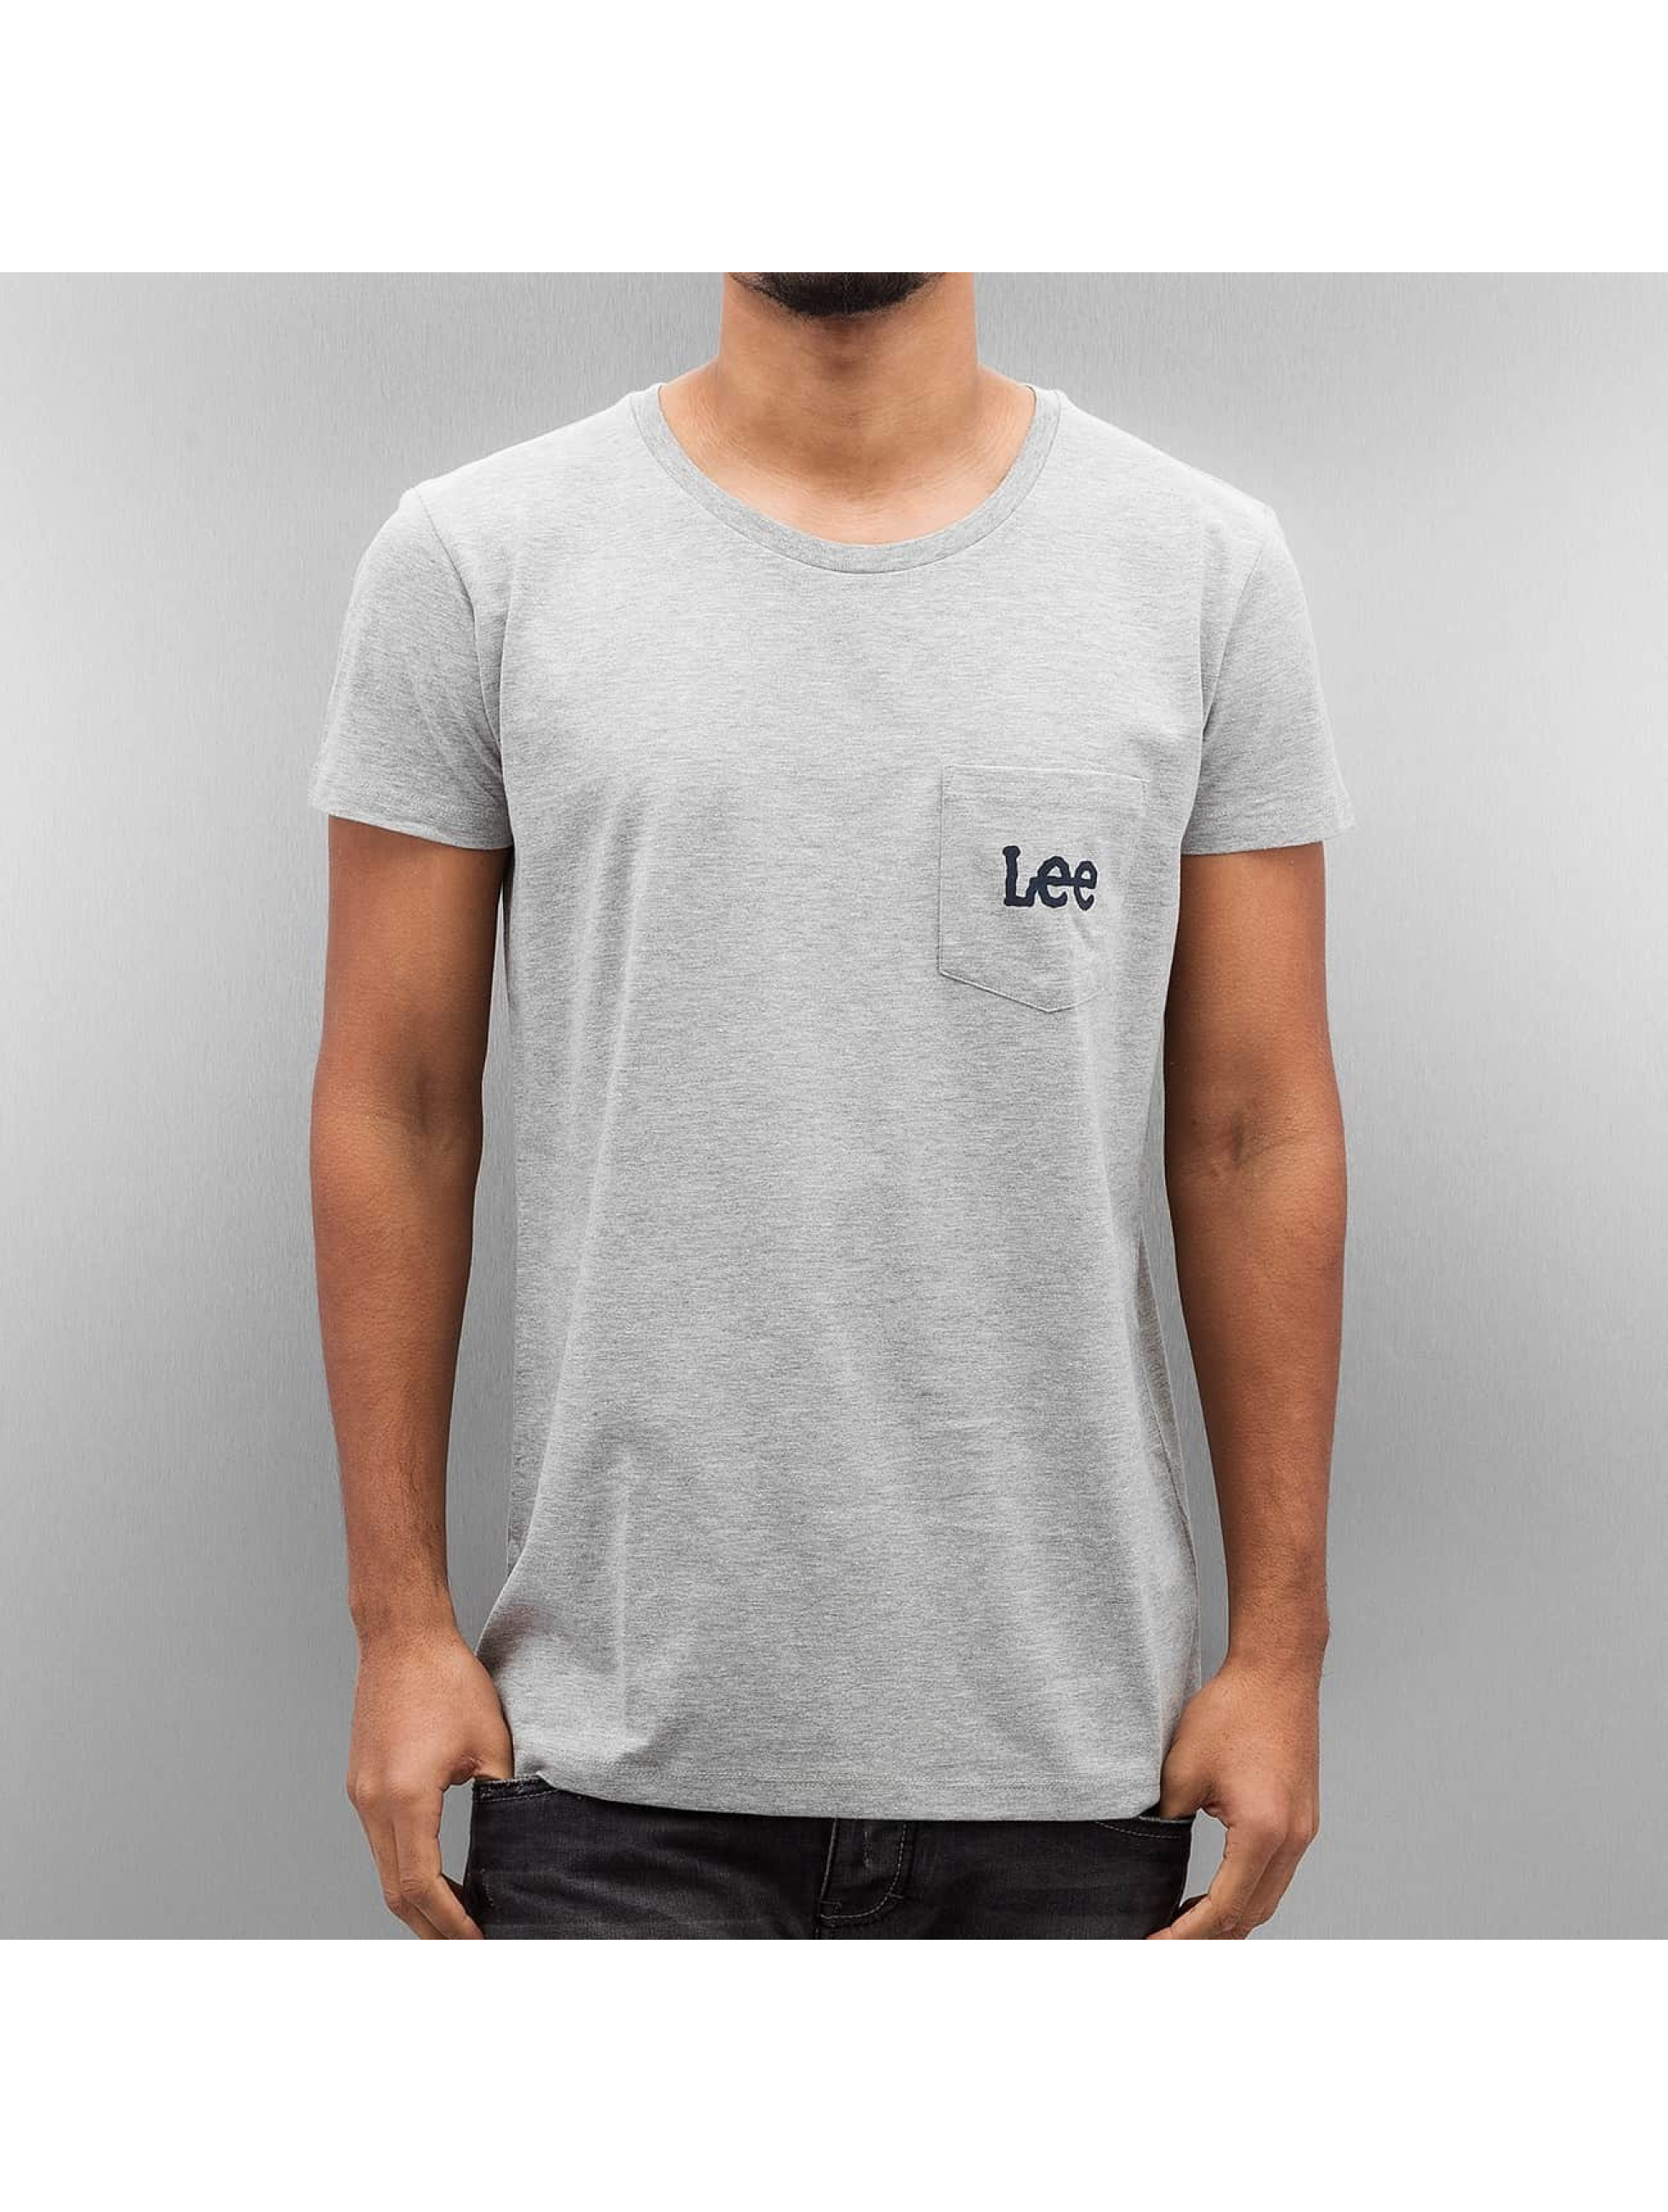 Forst (Lausitz) Angebote Lee Männer T-Shirt Pocket in grau